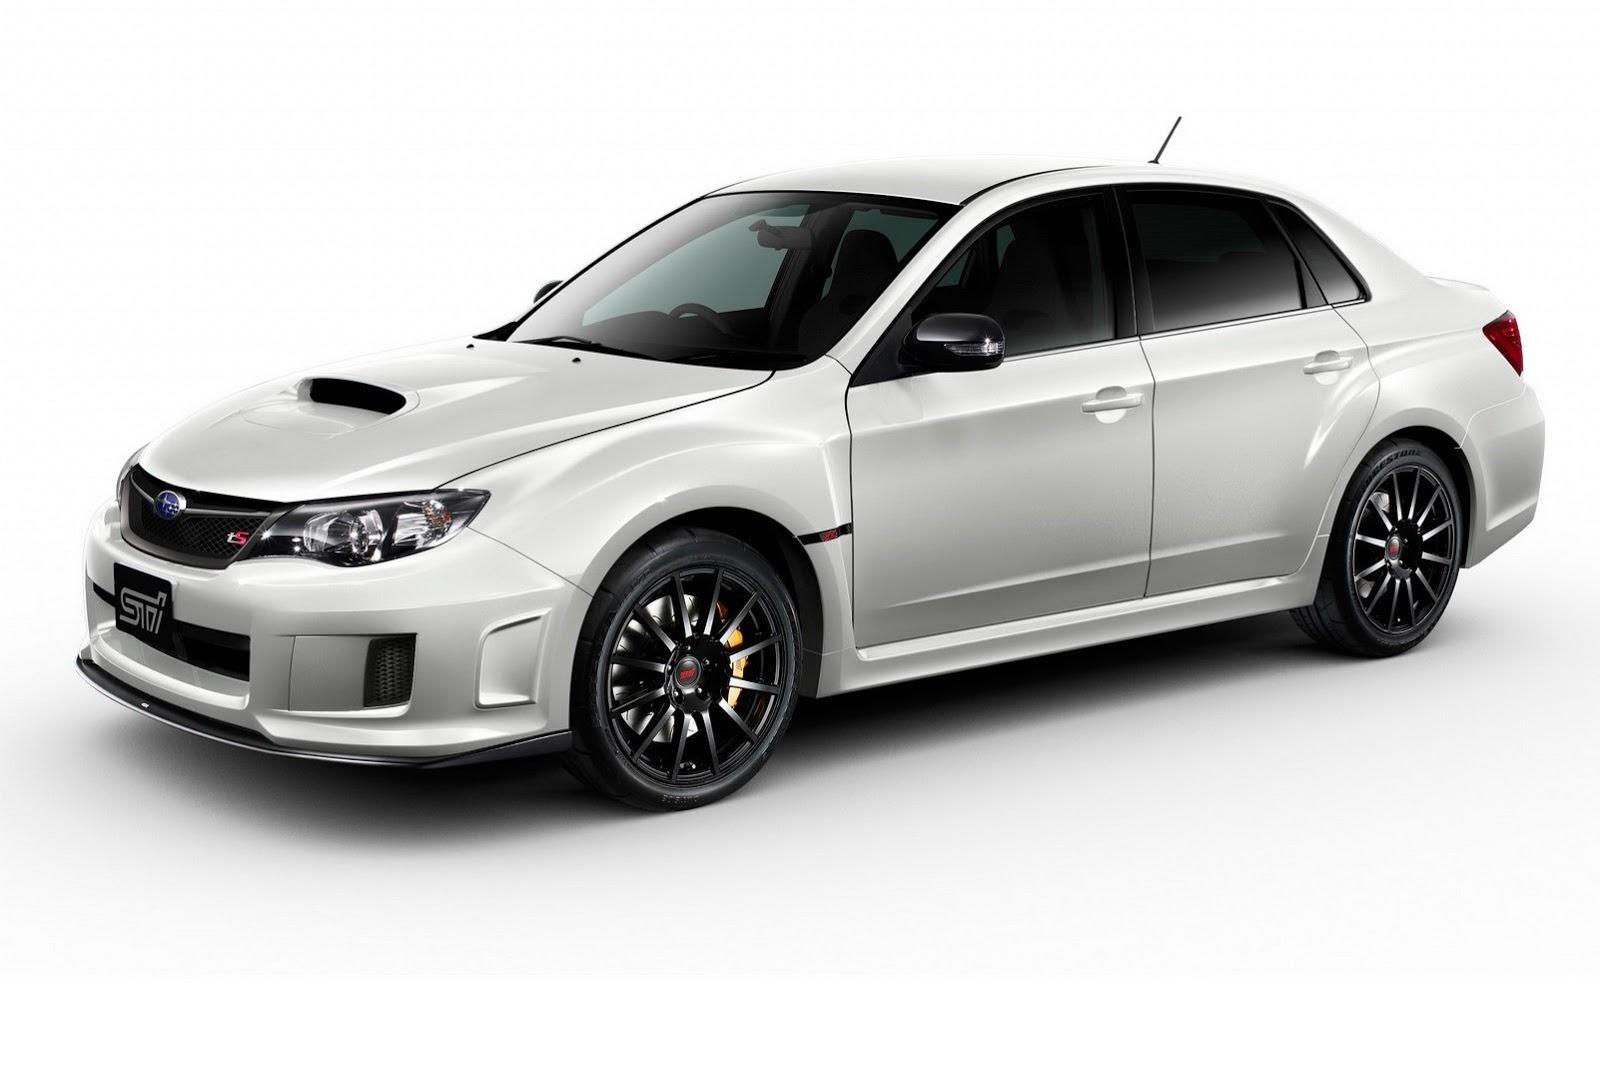 Subaru Wrx Sti Gets New Japan Exclusive Special Edition